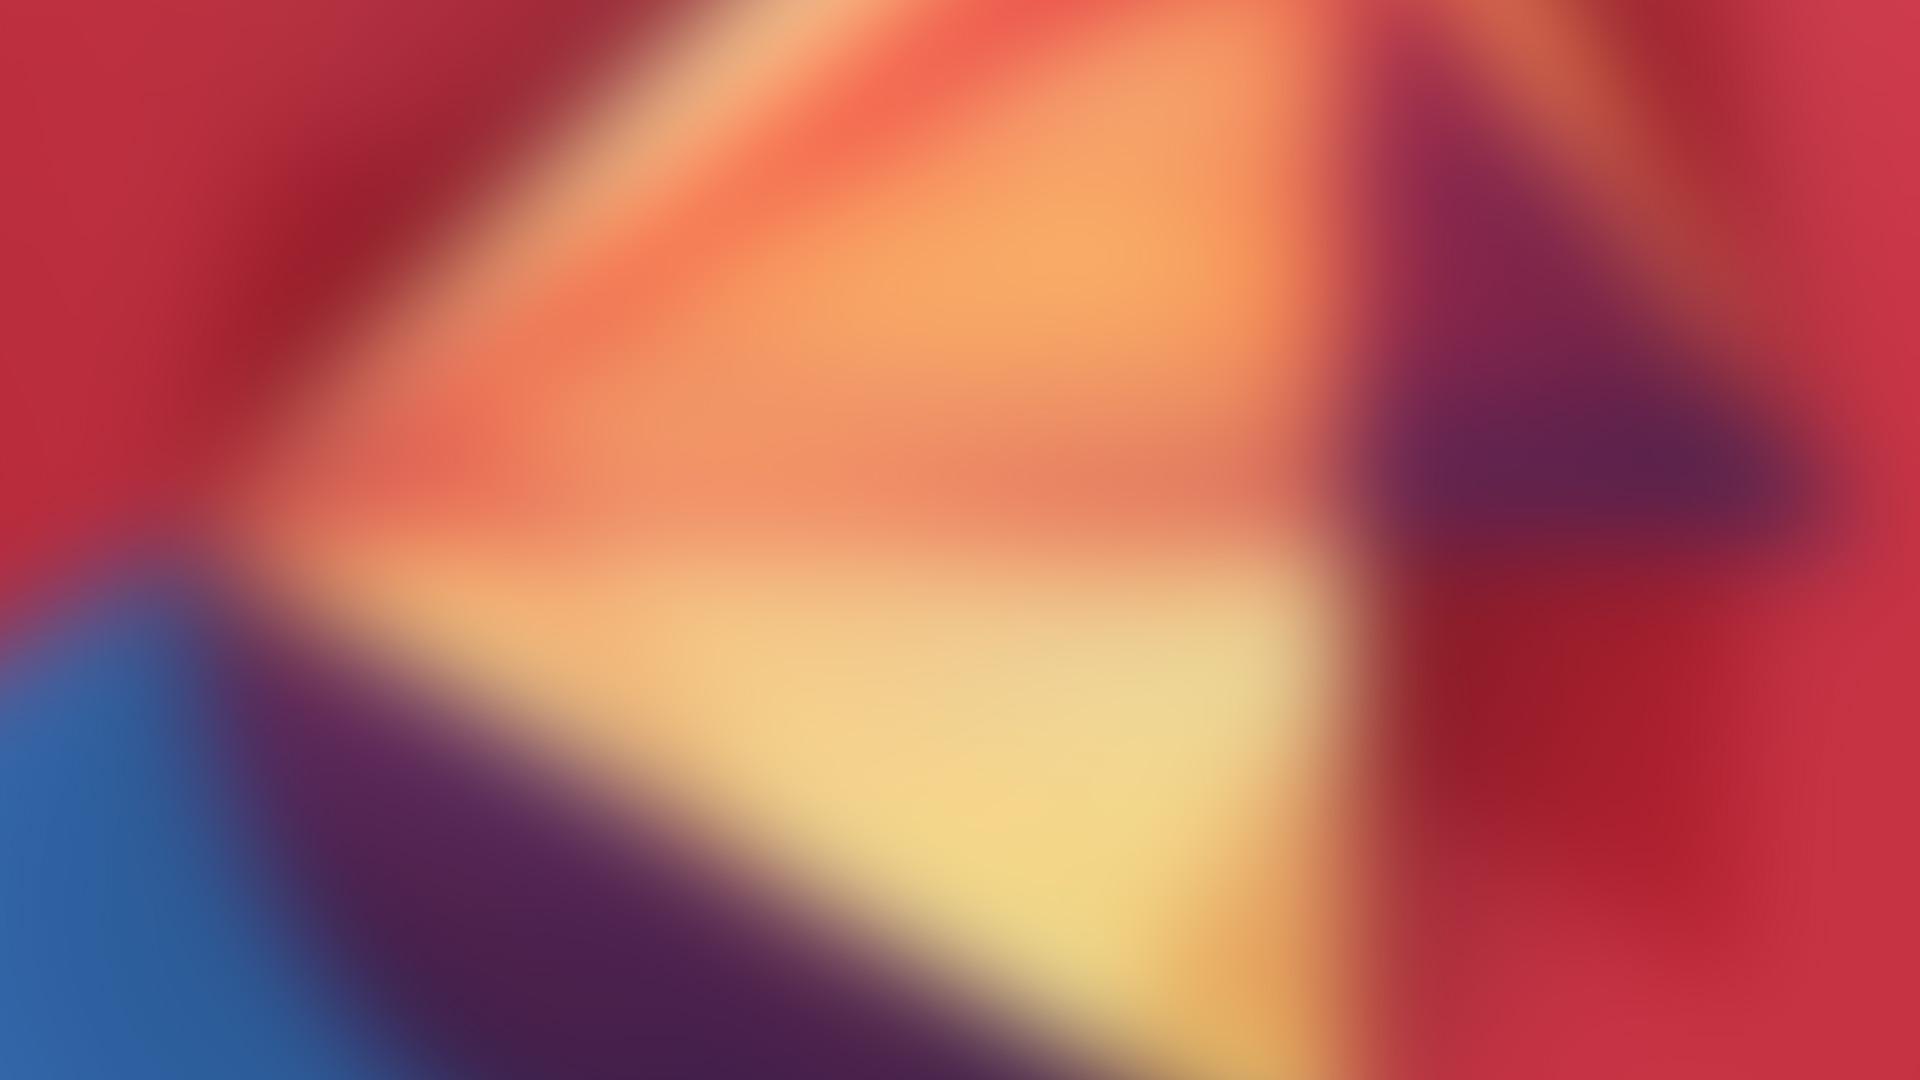 Mobilee236_Squire_HundredFallsRemixes_bg-blur